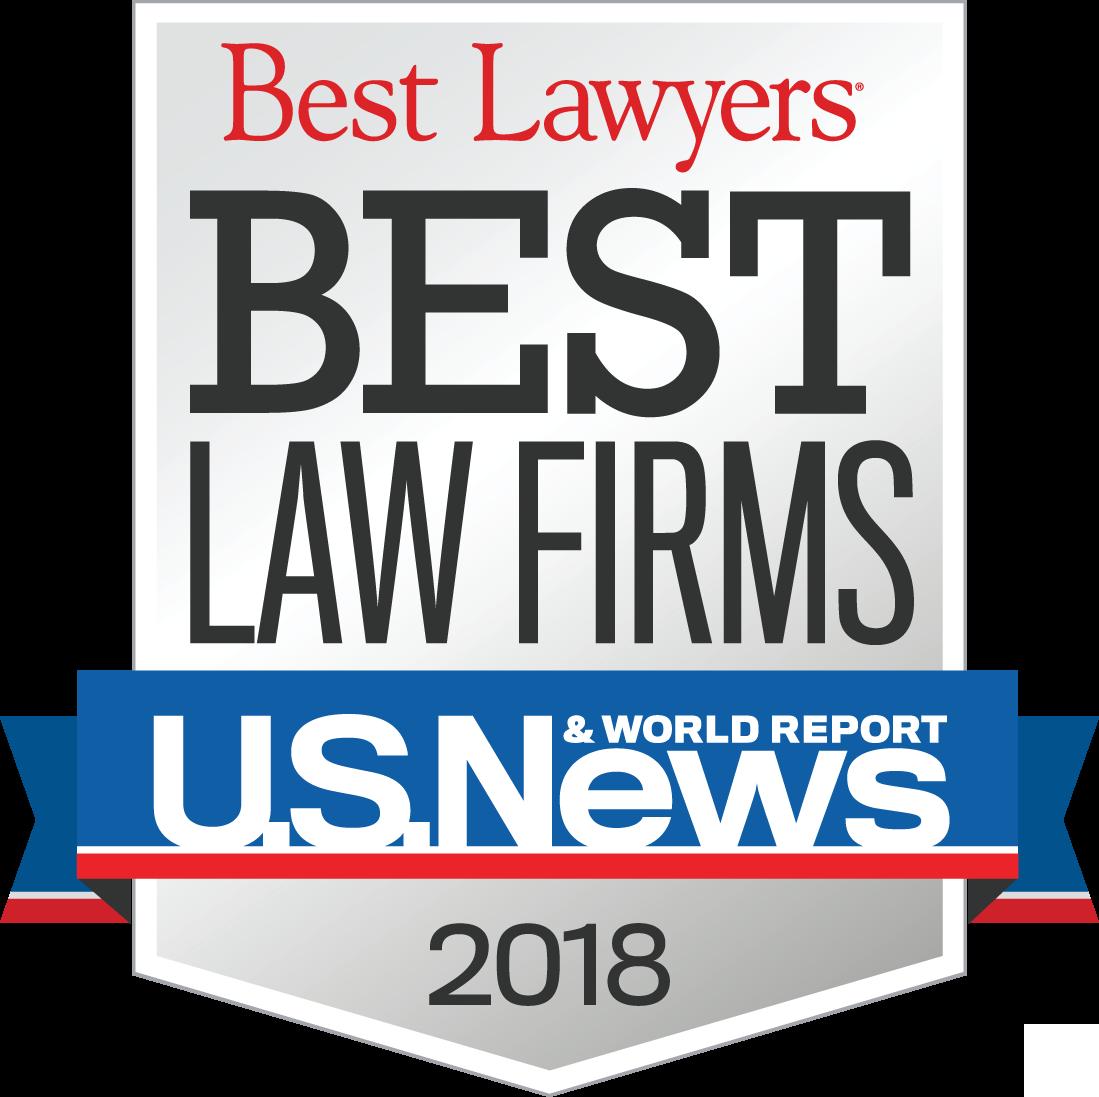 Rolf Goffman Martin Lang LLP Best Law Firm 2018